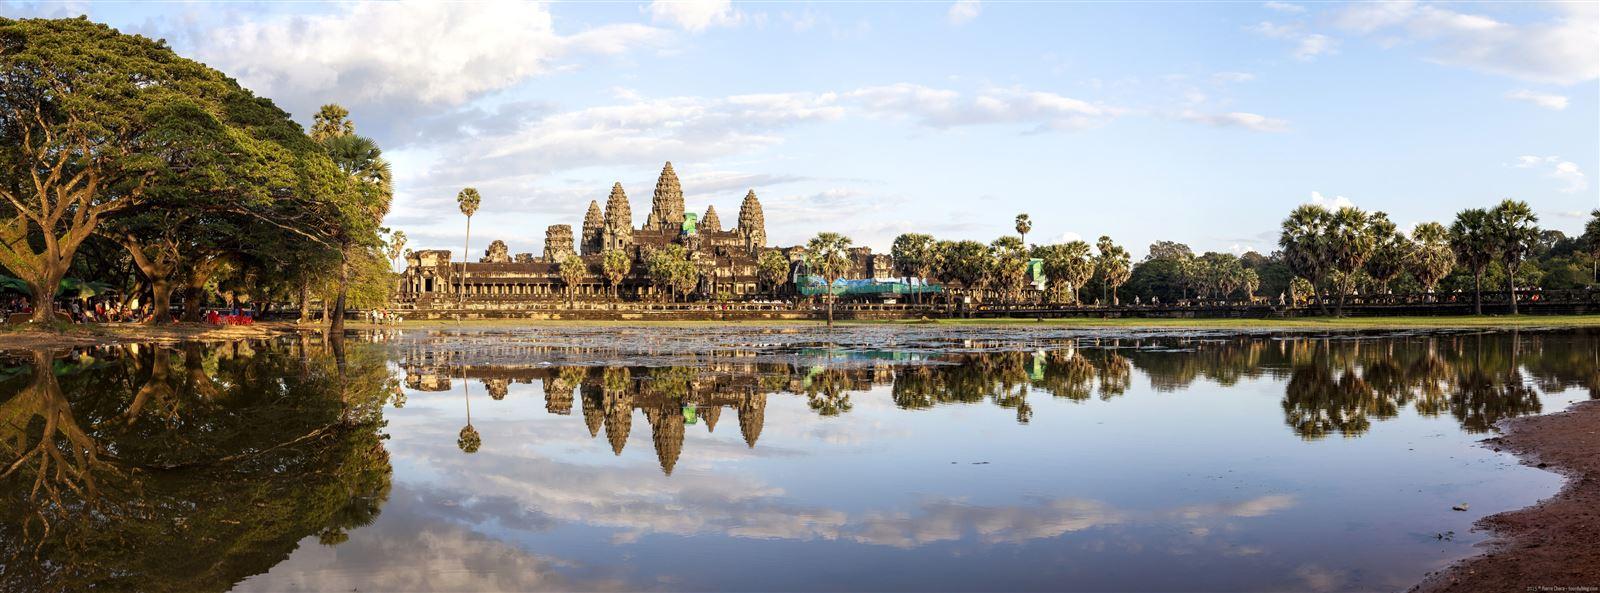 Panoramique-Angkor-Wat-Cambodge